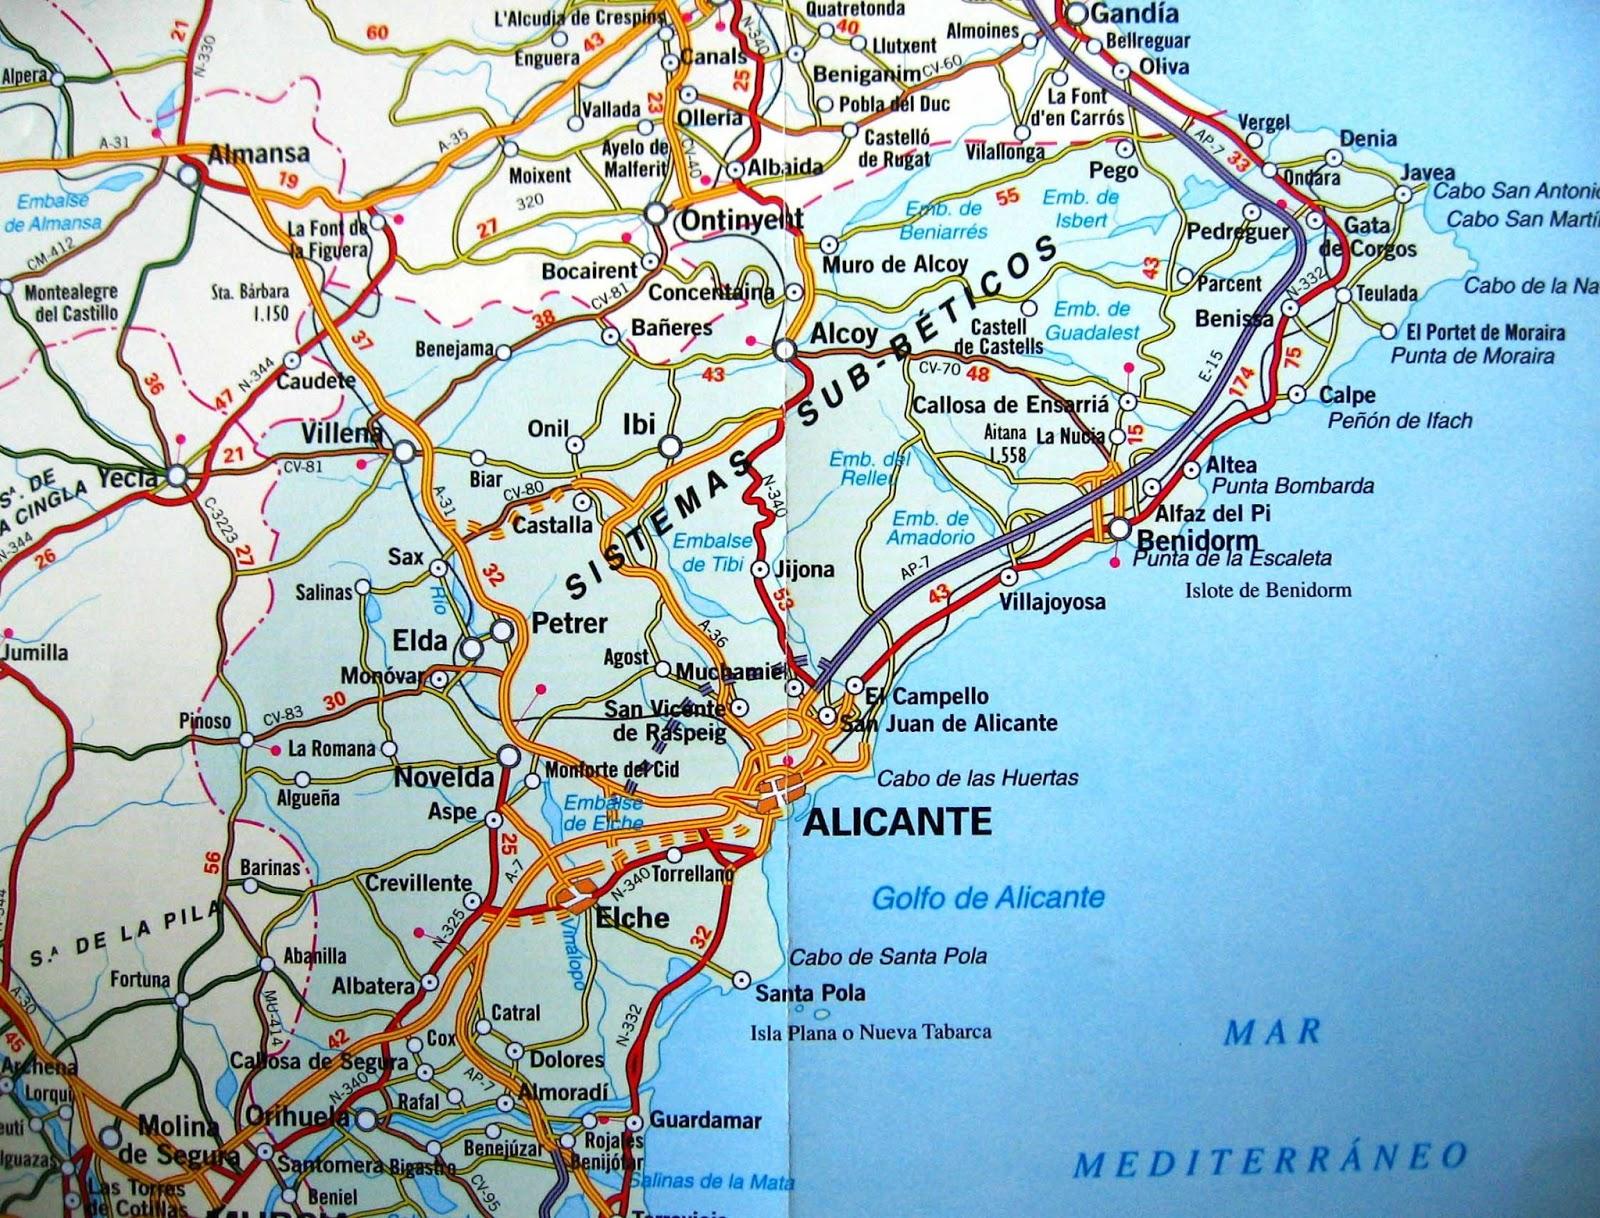 mapa comboios espanha Mapas de Alicante   Espanha | MapasBlog mapa comboios espanha